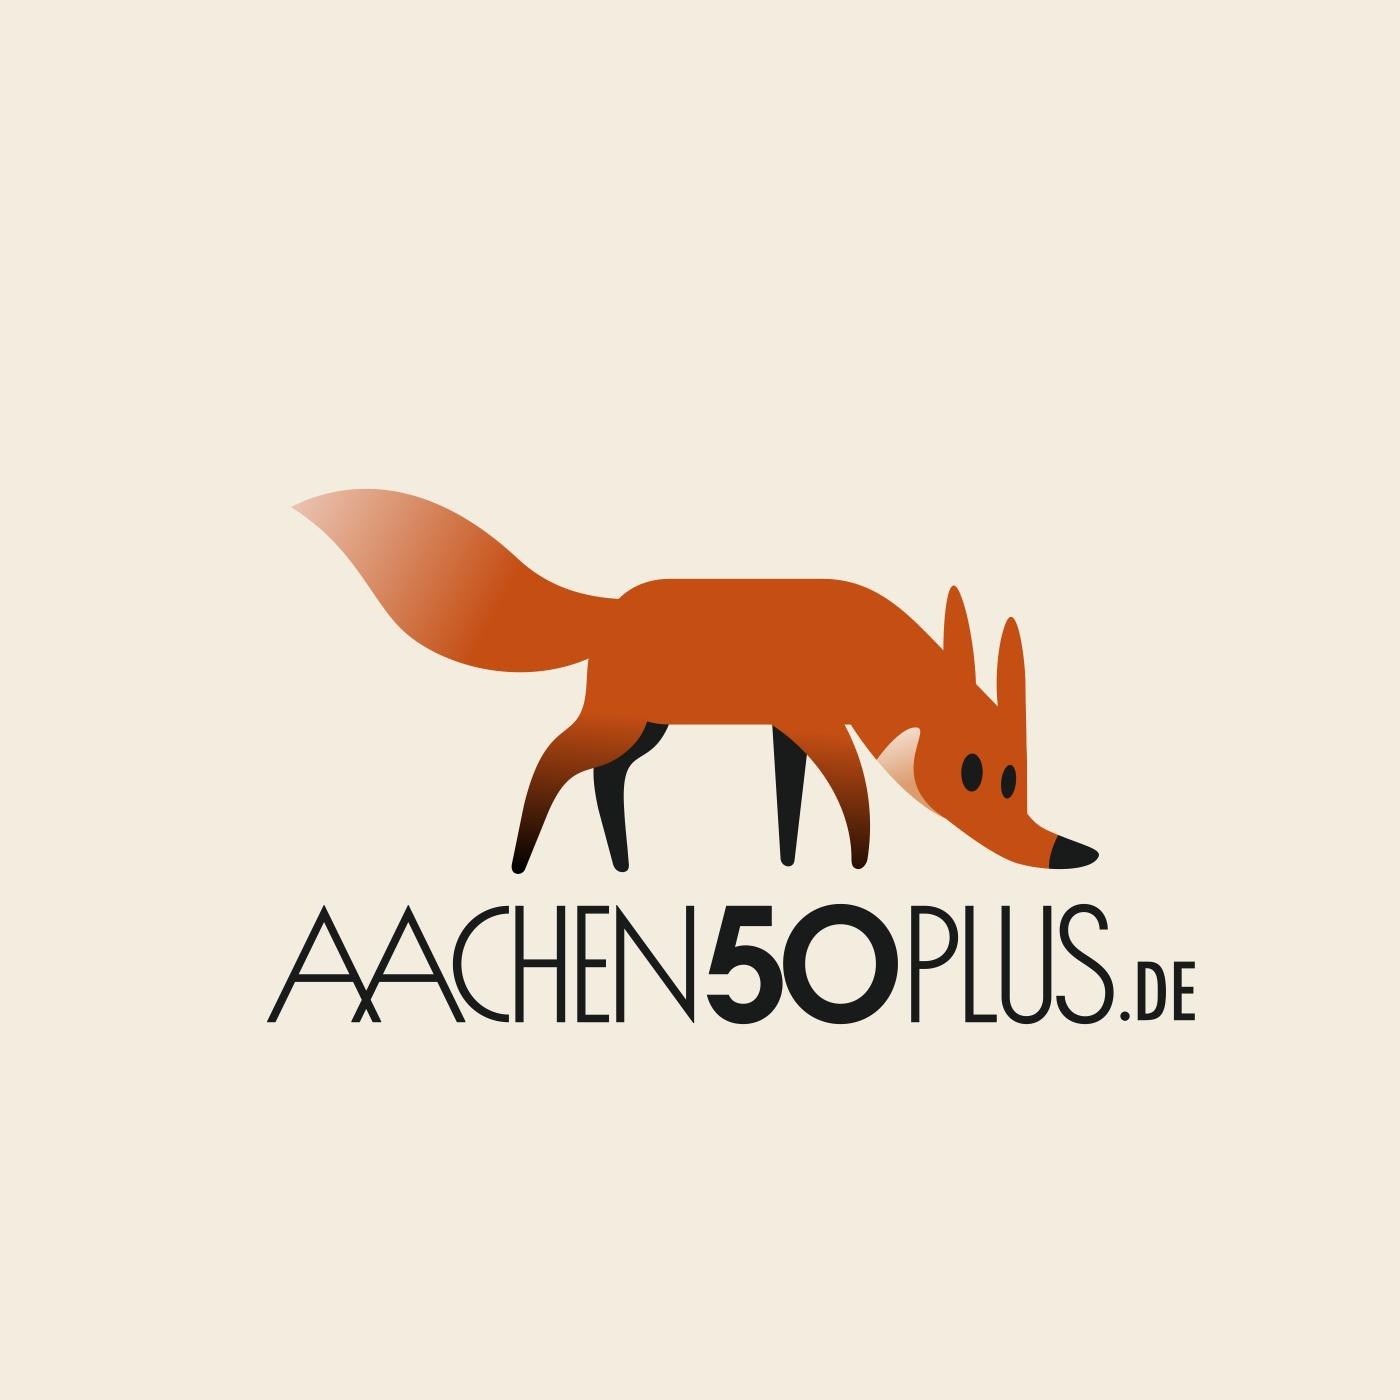 Aachen50Plus_01.jpg